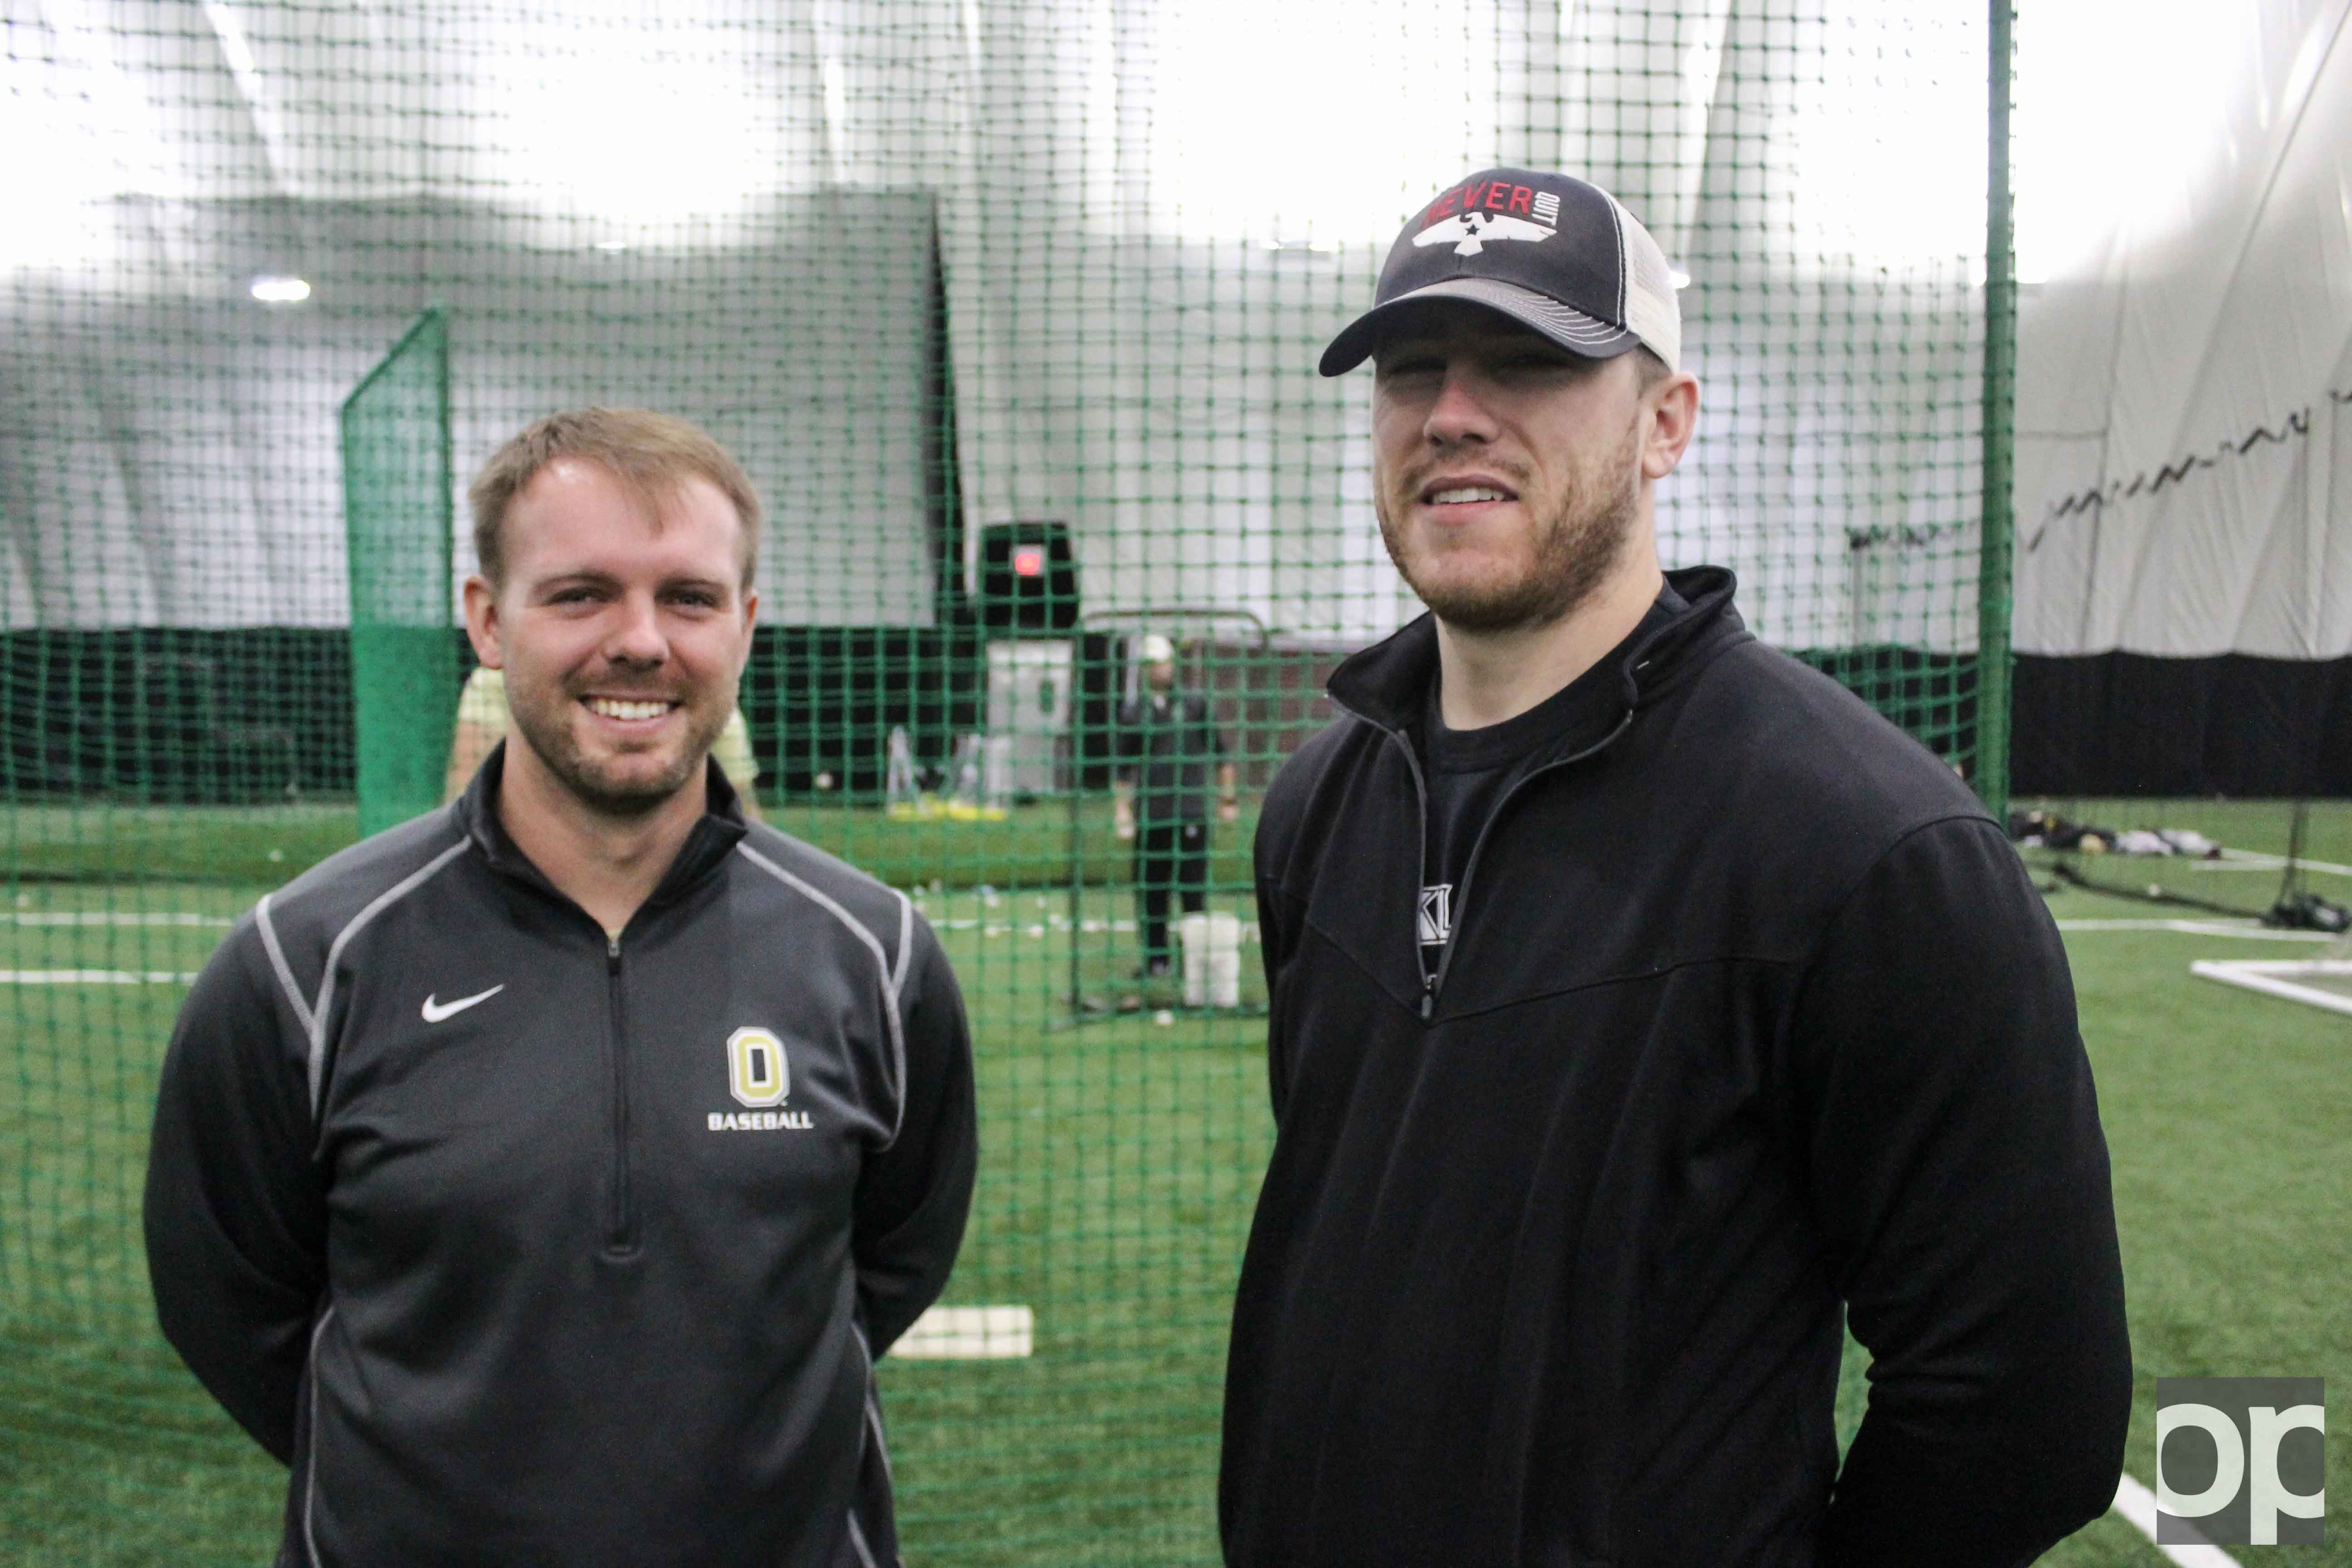 Co-head Coaches Colin Kaline (left) and Jacke Healey (right) will lead Oakland's baseball team this season.